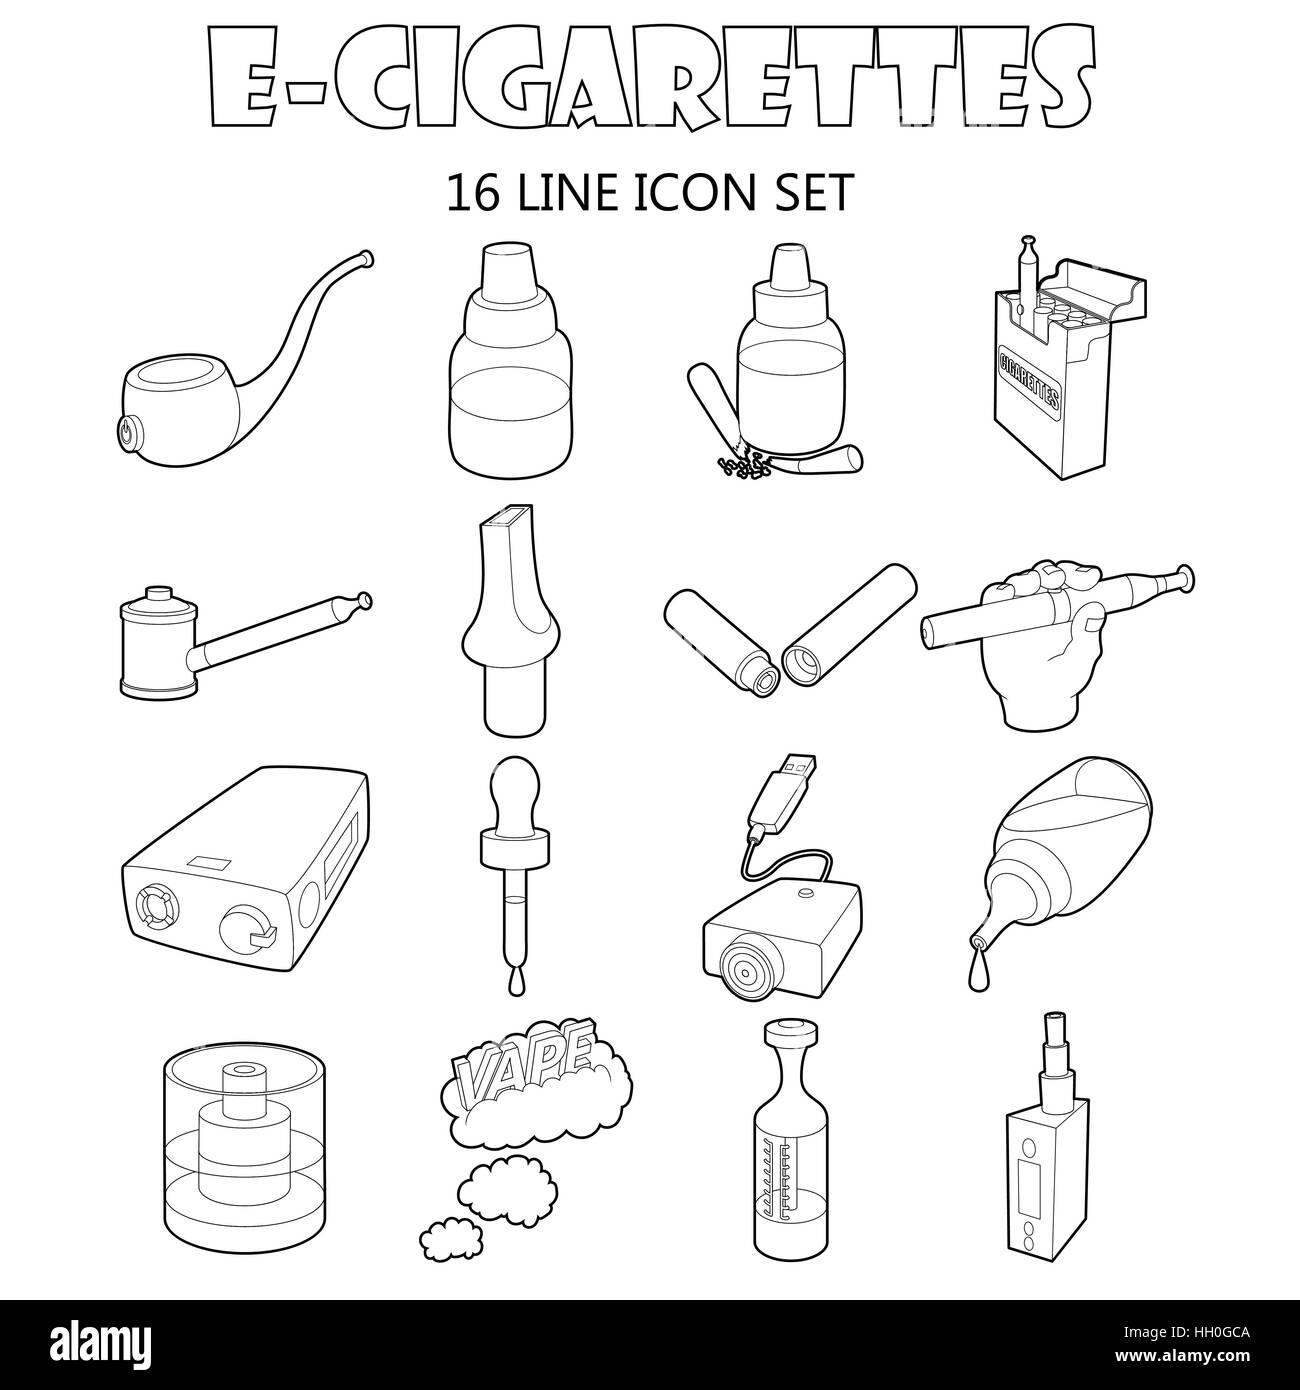 E-cigarettes icons set, outline style - Stock Image